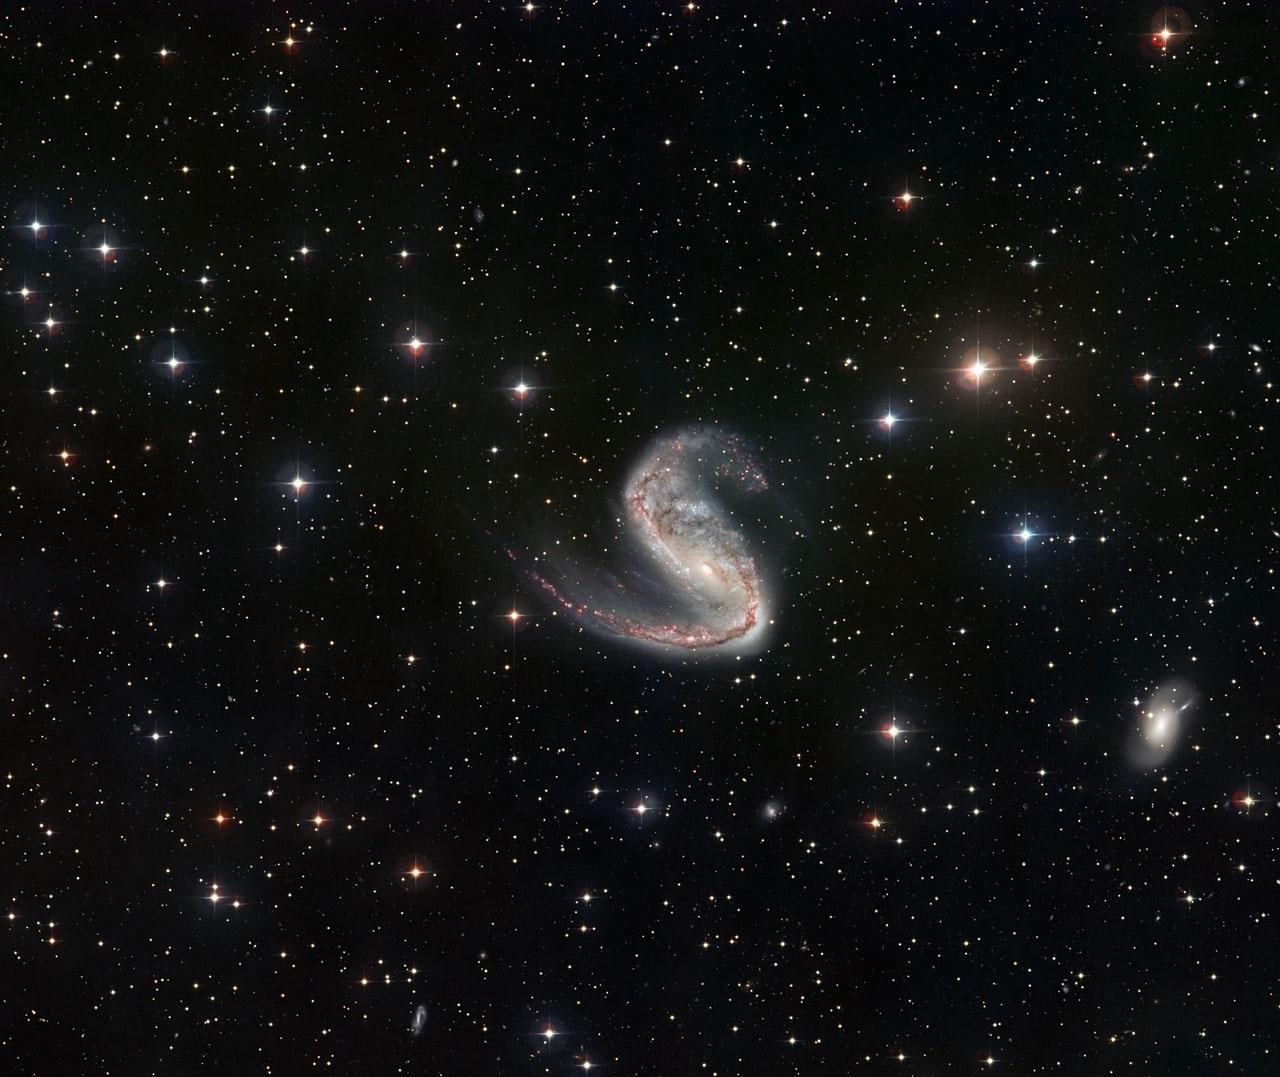 Stock image galaxies